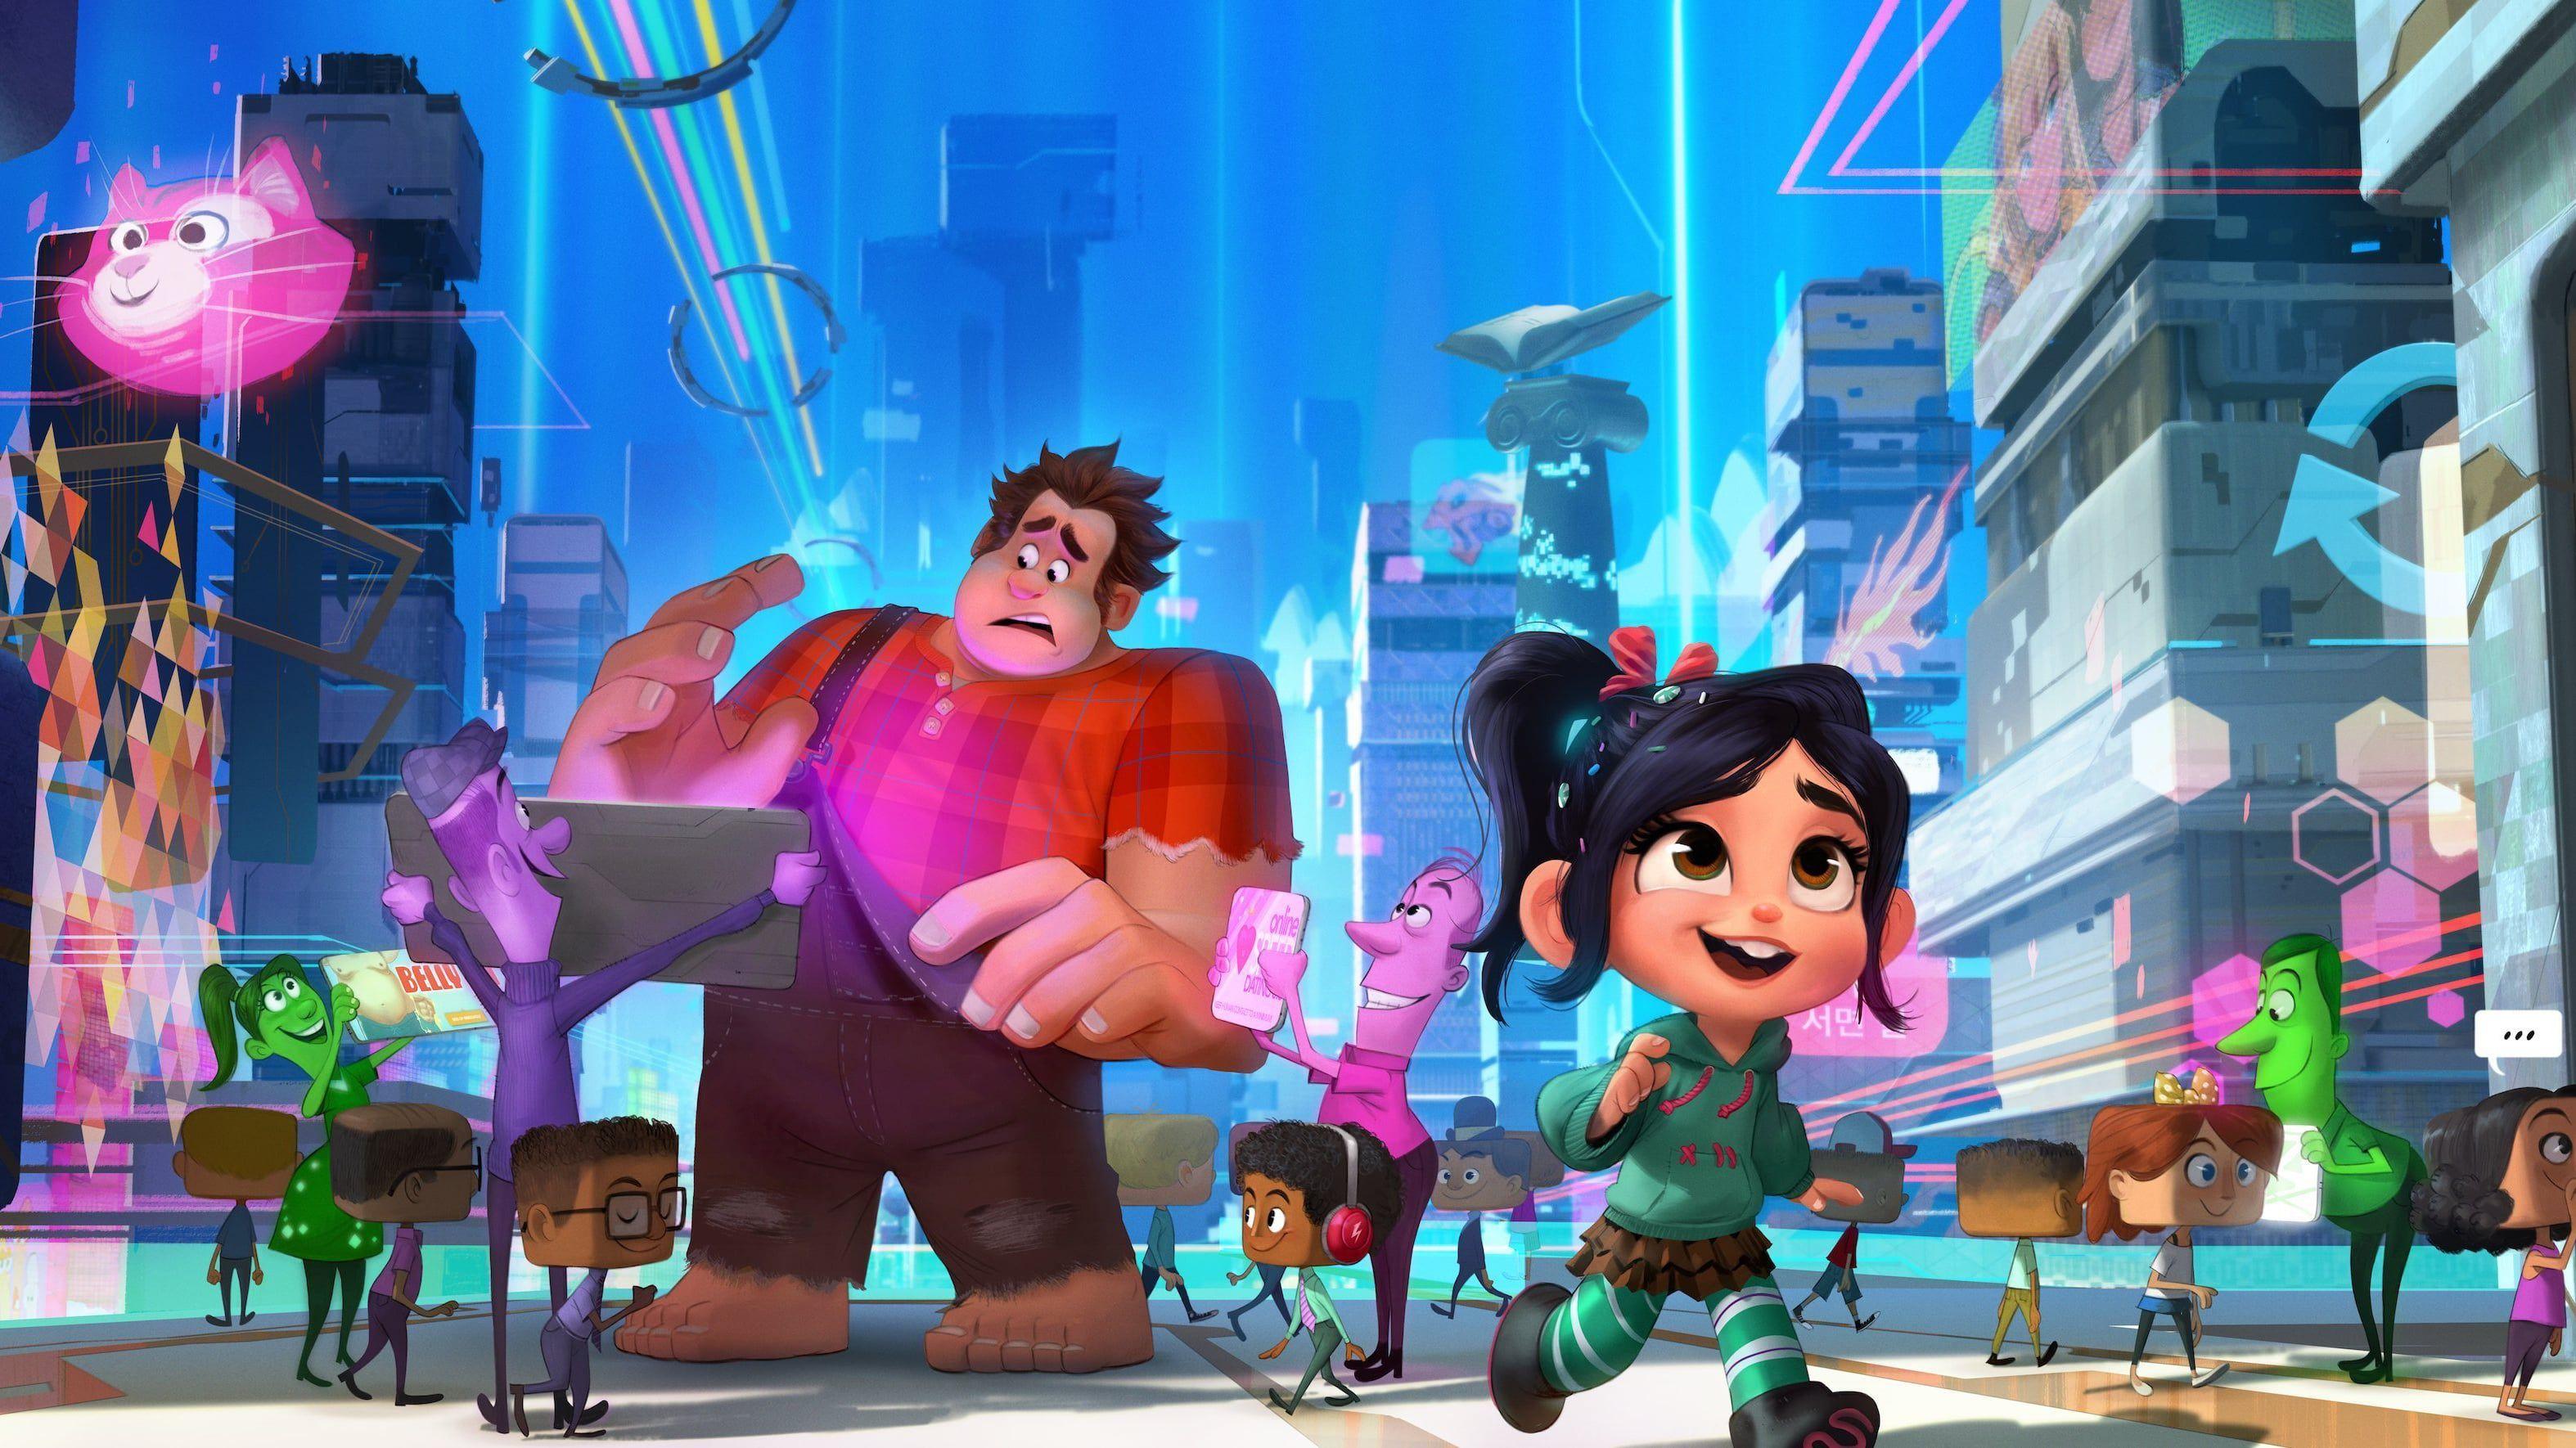 Ralph Lezuzza A Netet 2018 Online Teljes Film Filmek Magyarul Letoltes Hd A Videojatekok Walt Disney Pictures Walt Disney Animation Studios Free Movies Online